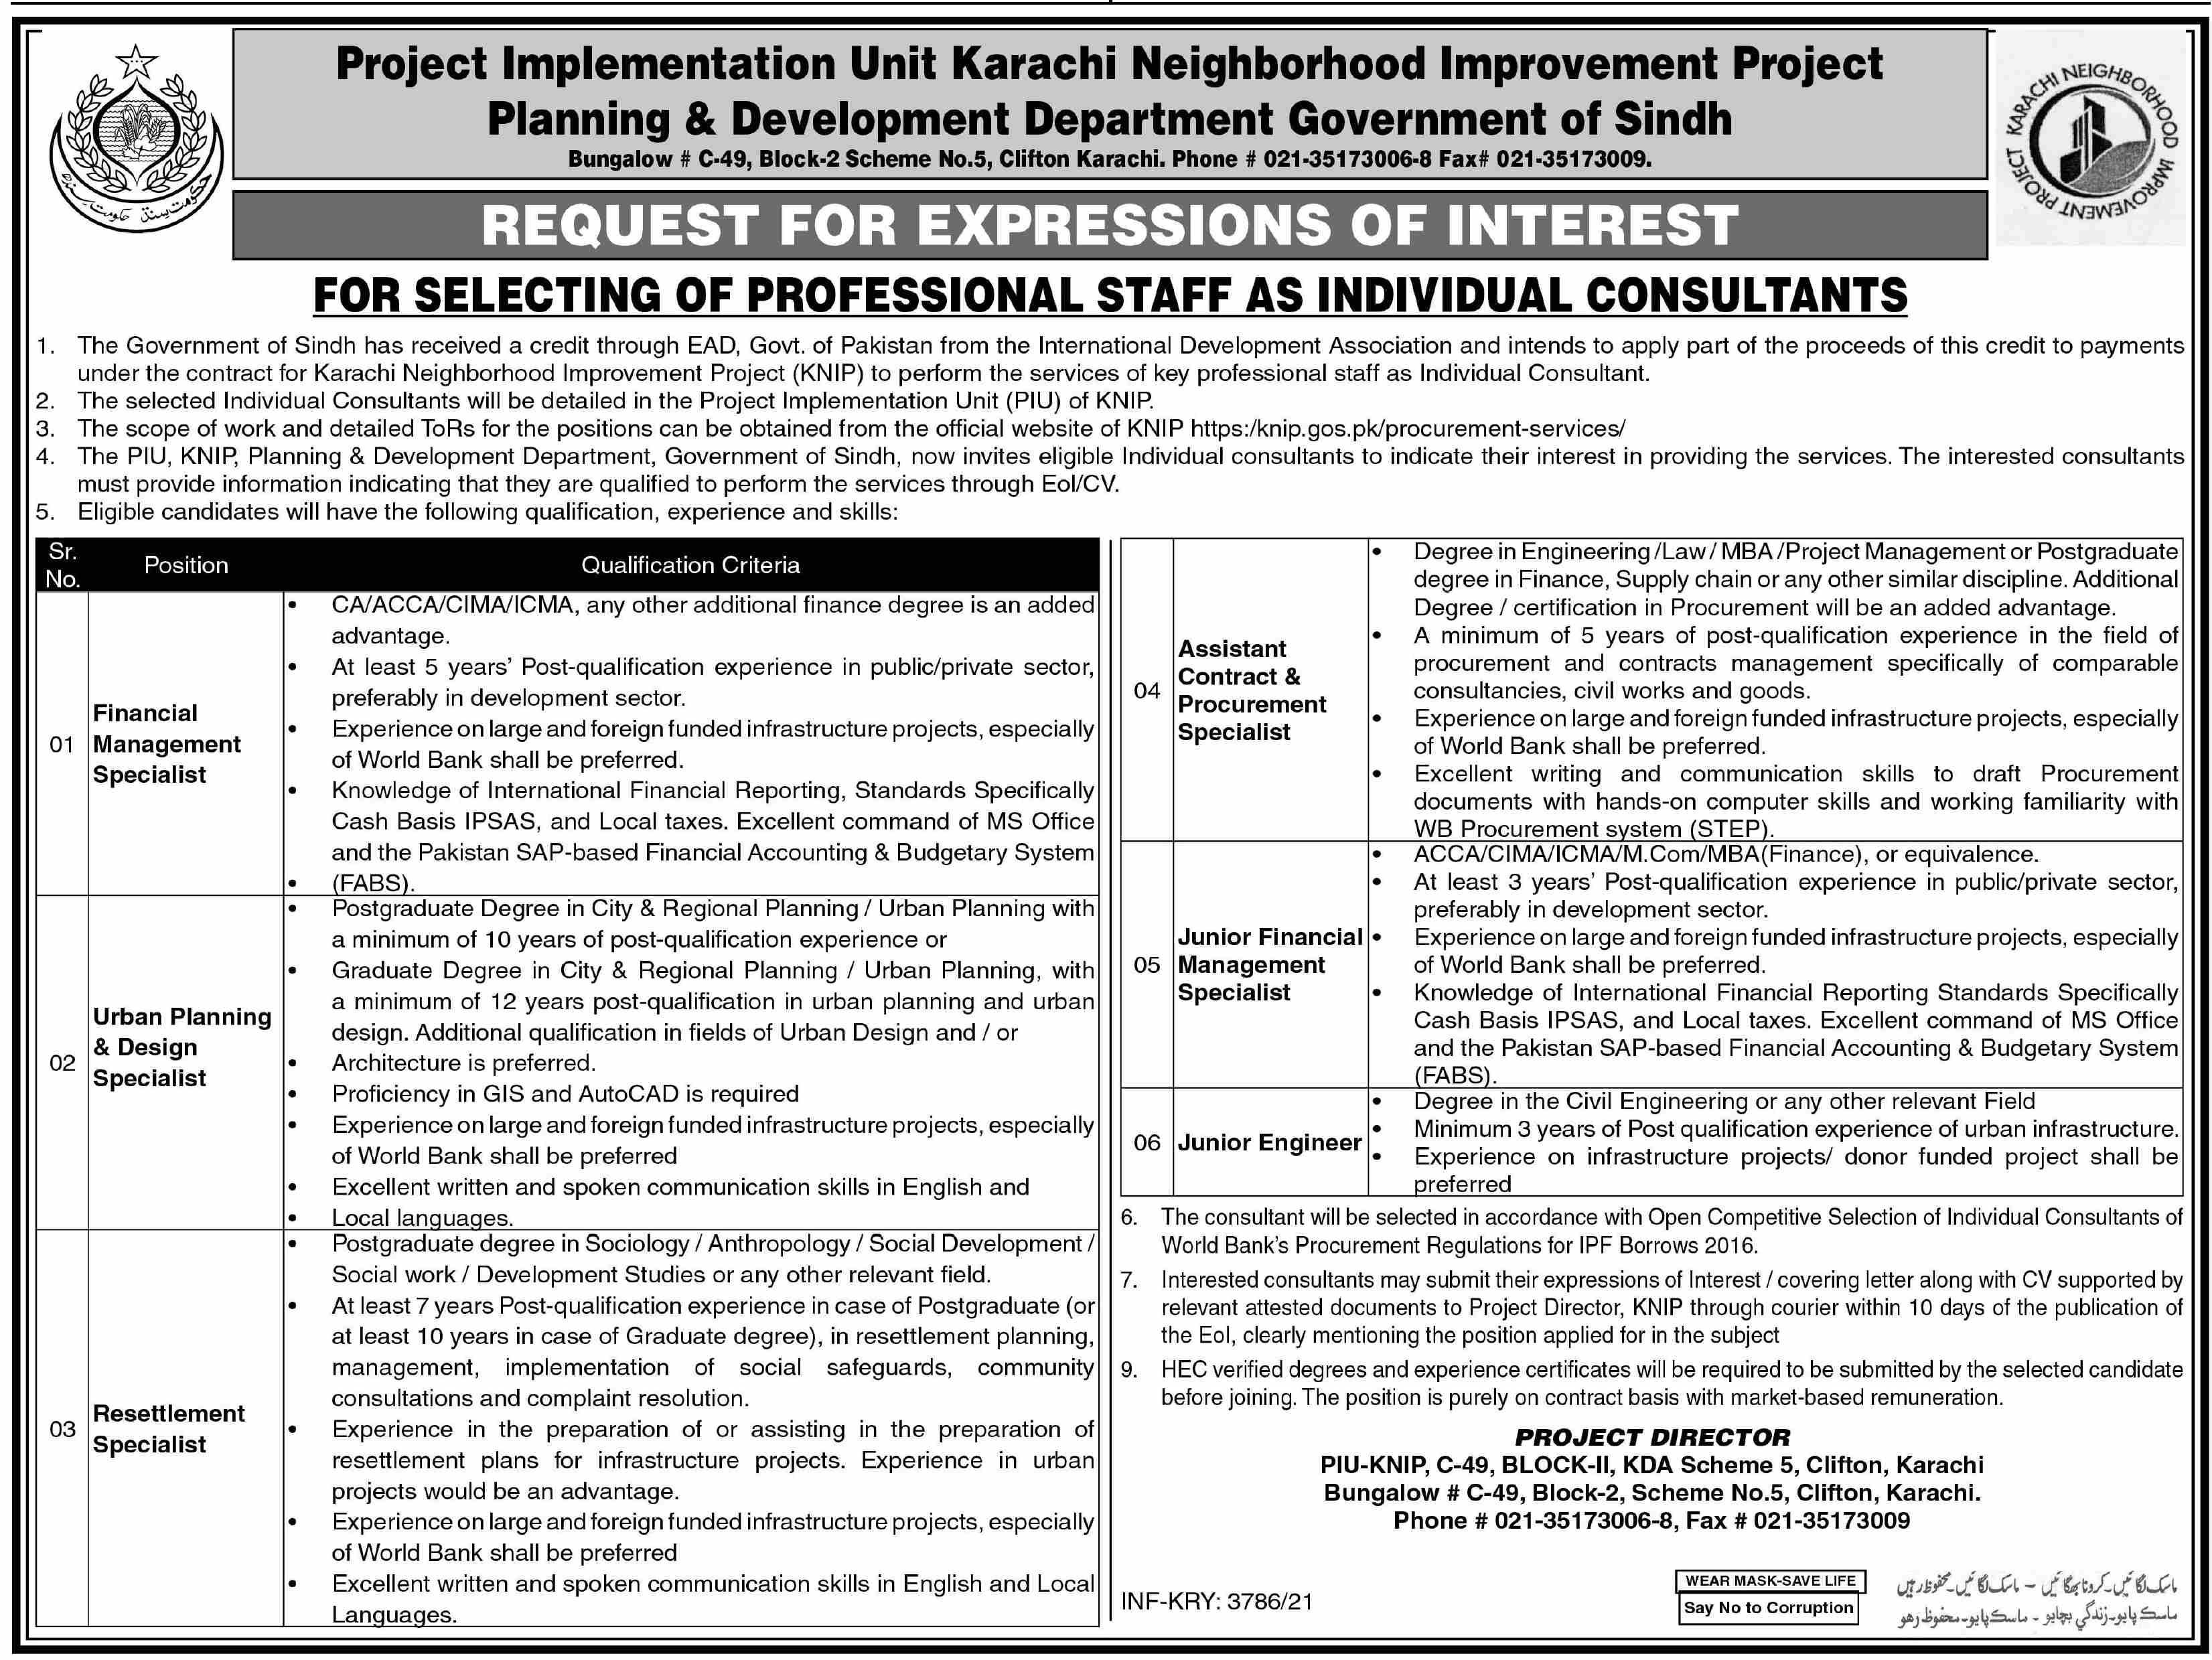 Project Implementation Unit Karachi Neighborhood Improvement Project Planning & Development Jobs 2021 – Latest Jobs 3